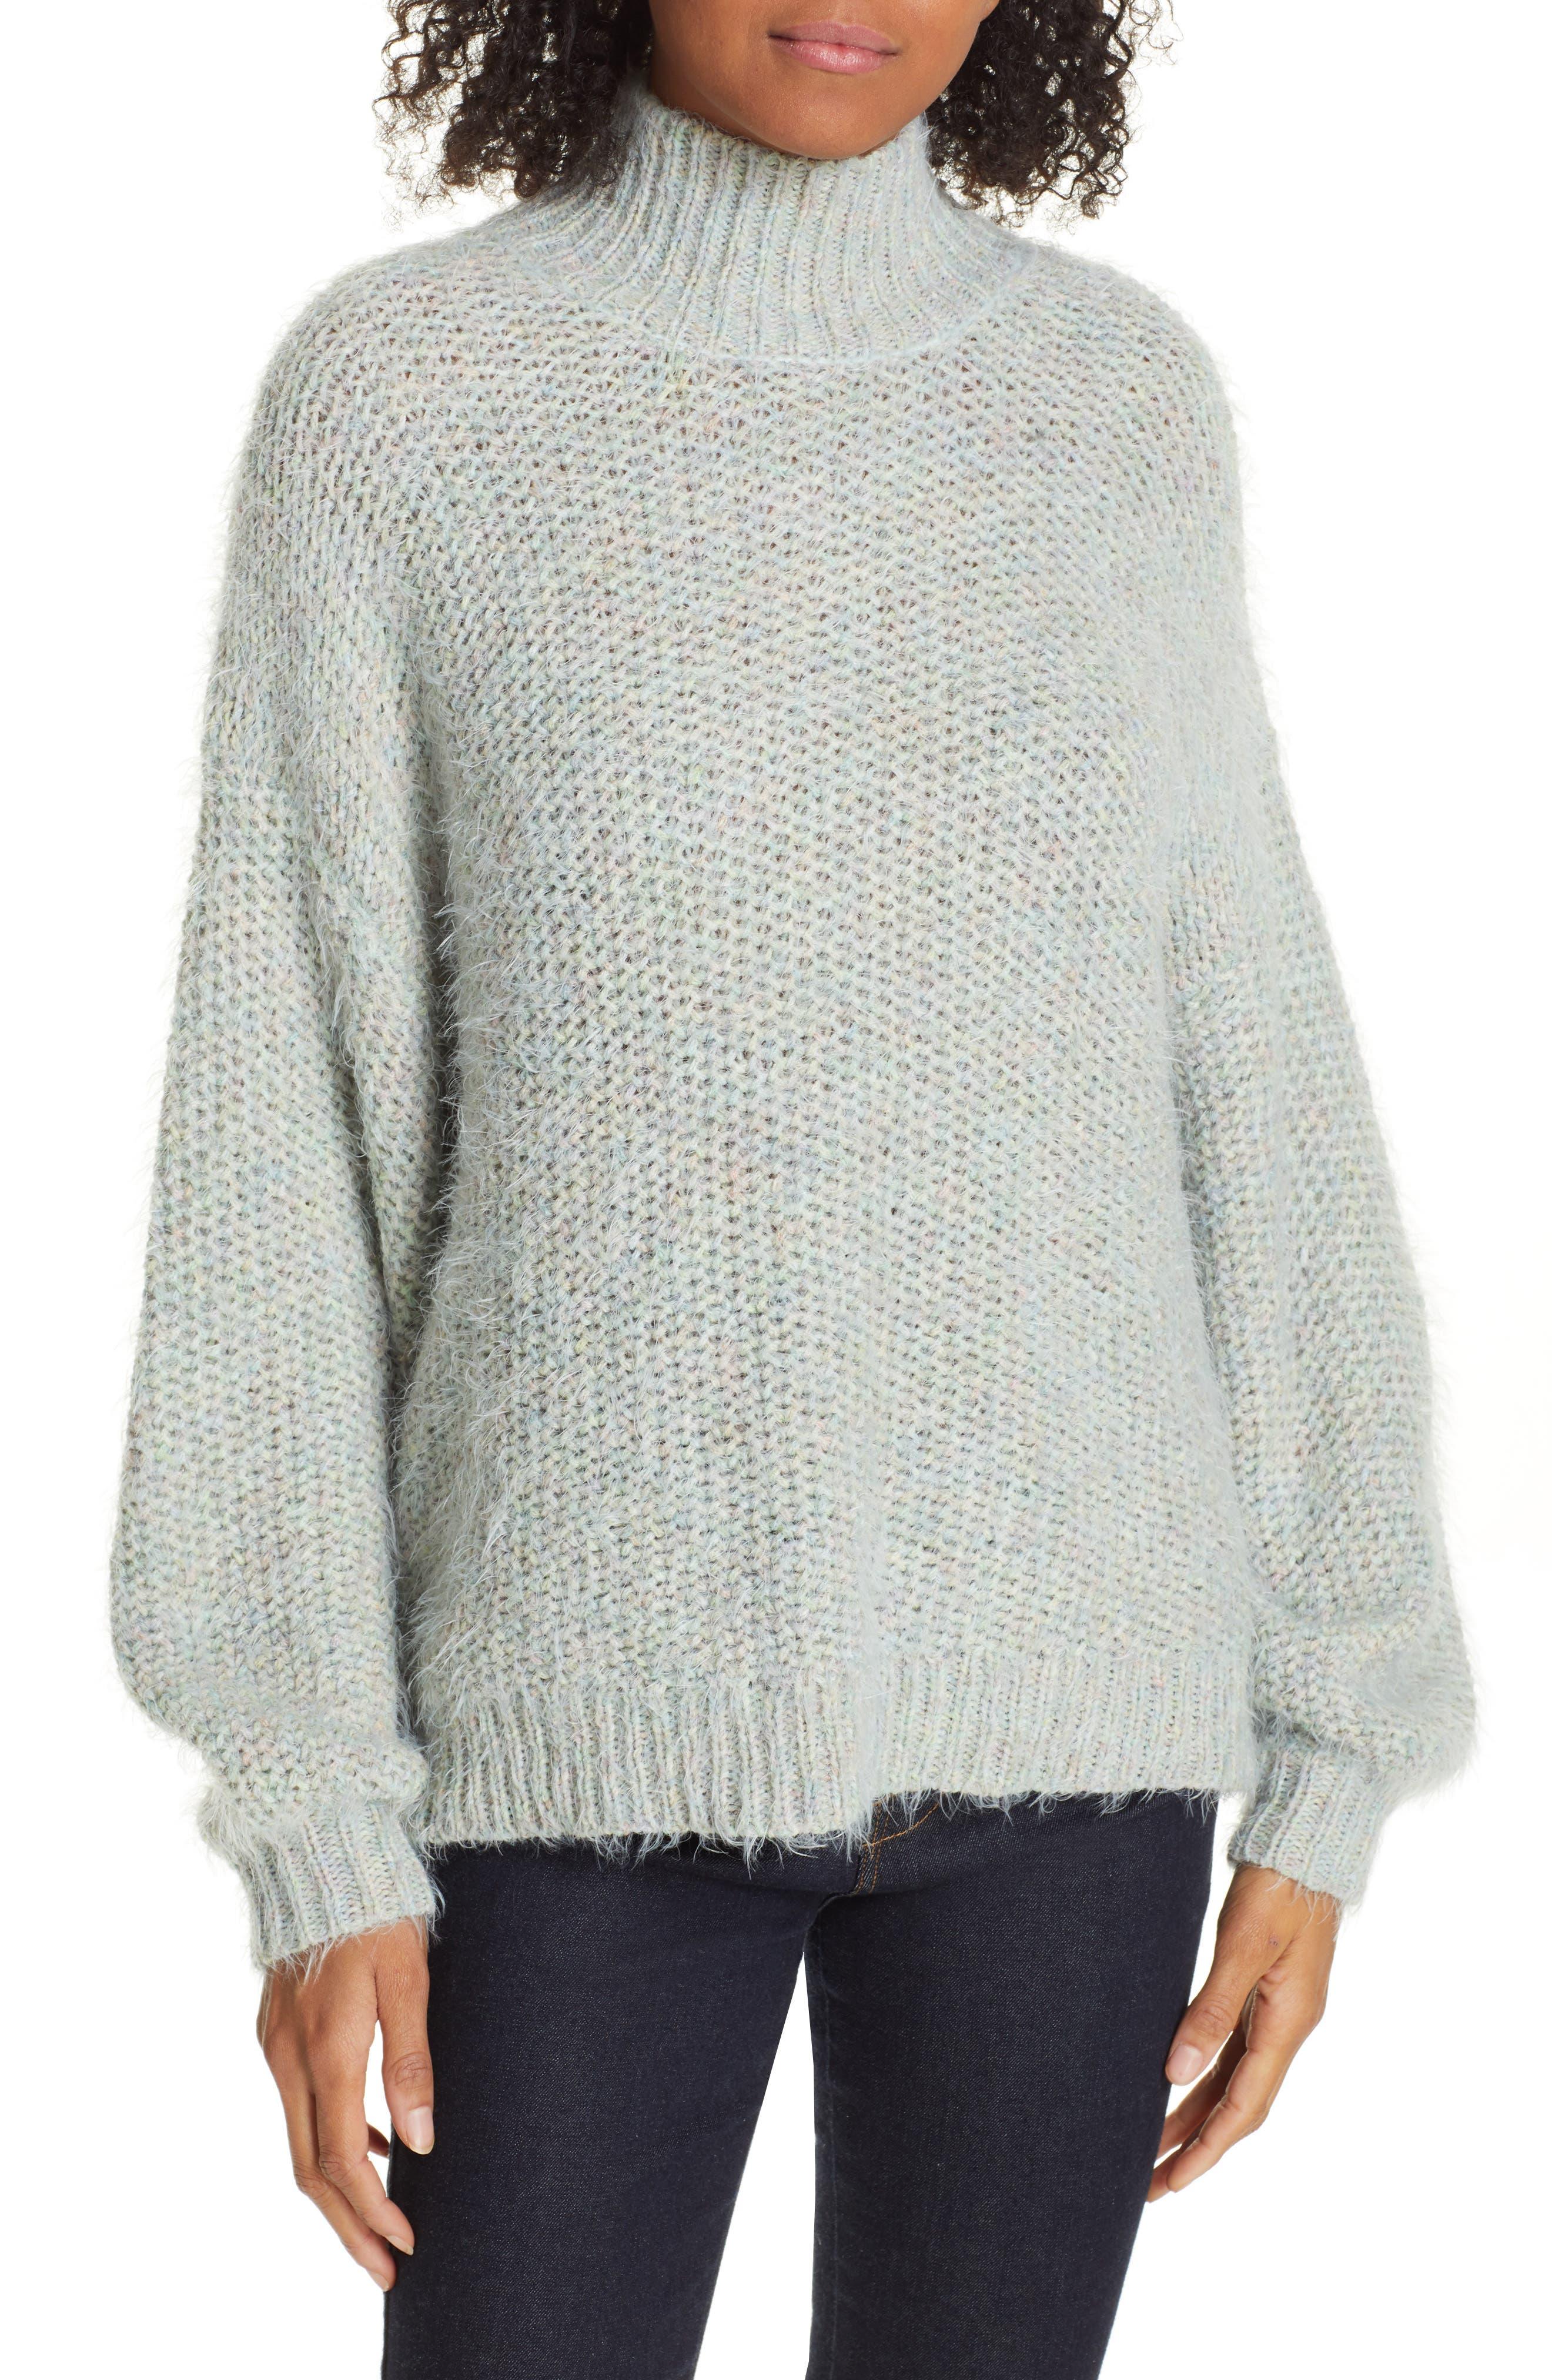 Markita Sweater,                             Main thumbnail 1, color,                             HEATHER CELADON